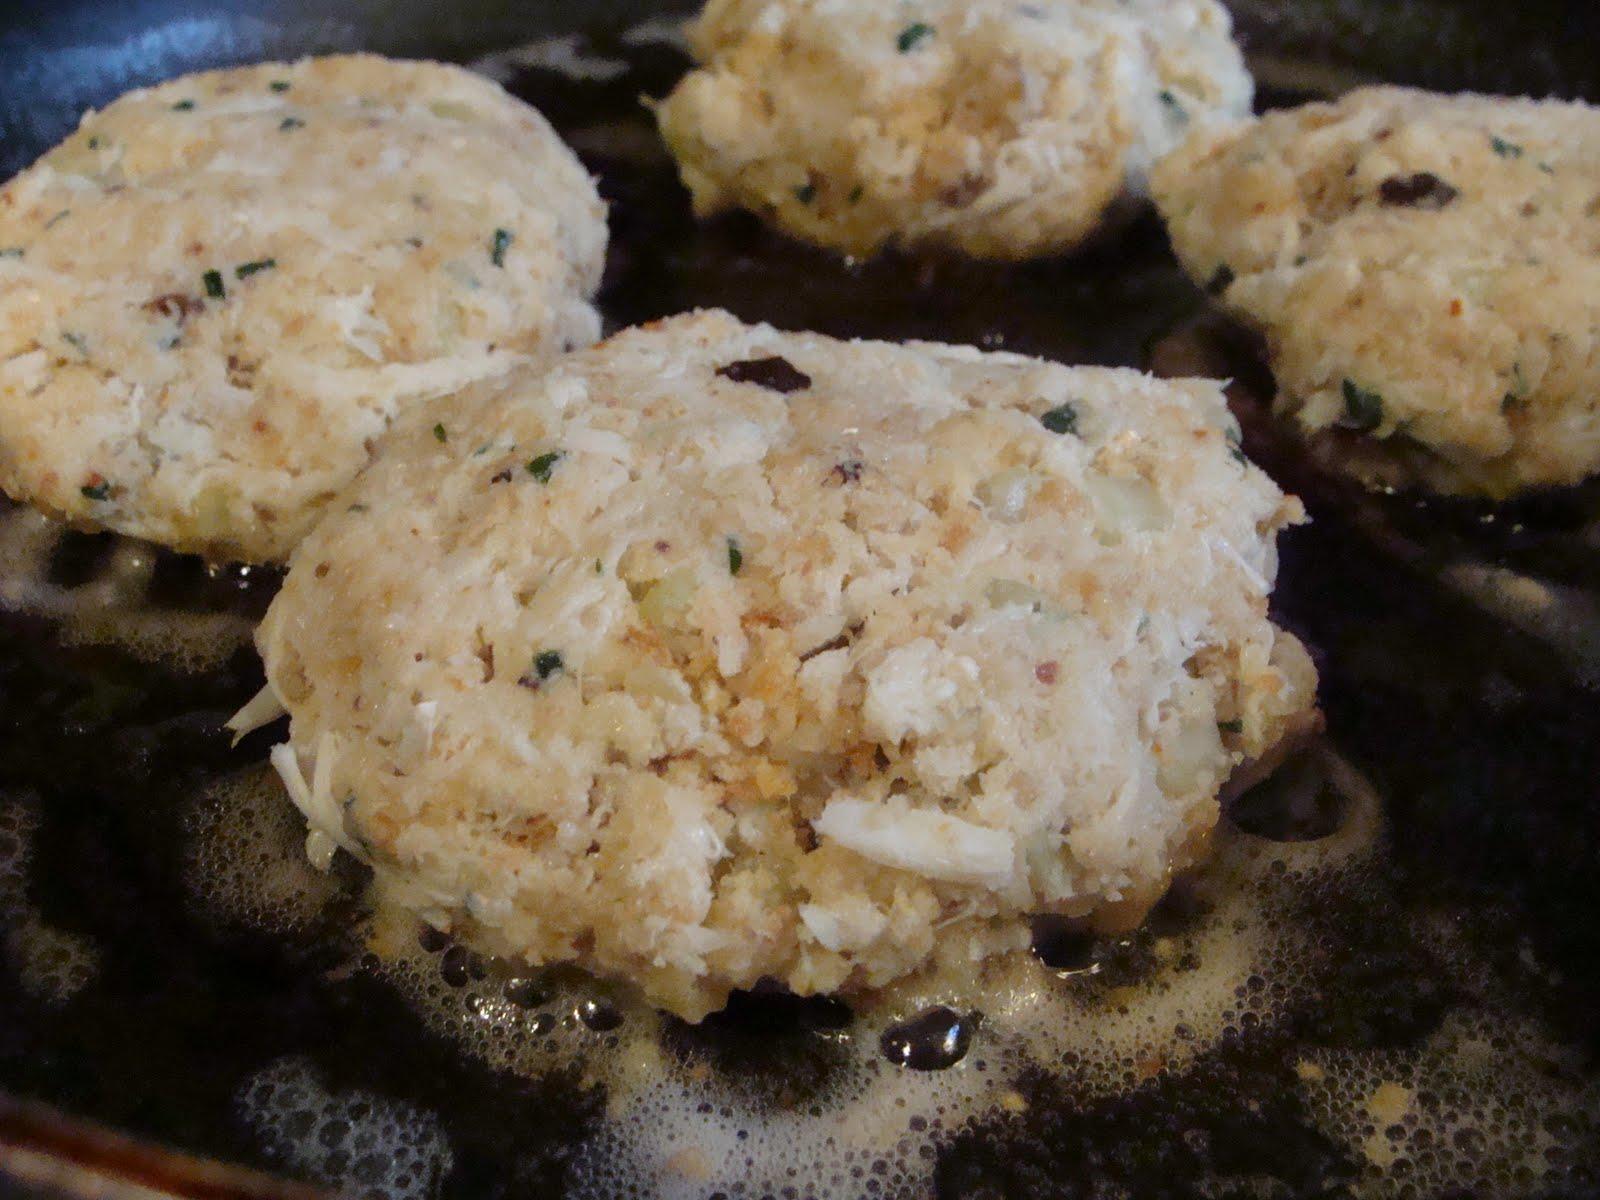 "... "" Smitten Kitchen's corn, buttermilk & chive popovers as a side"